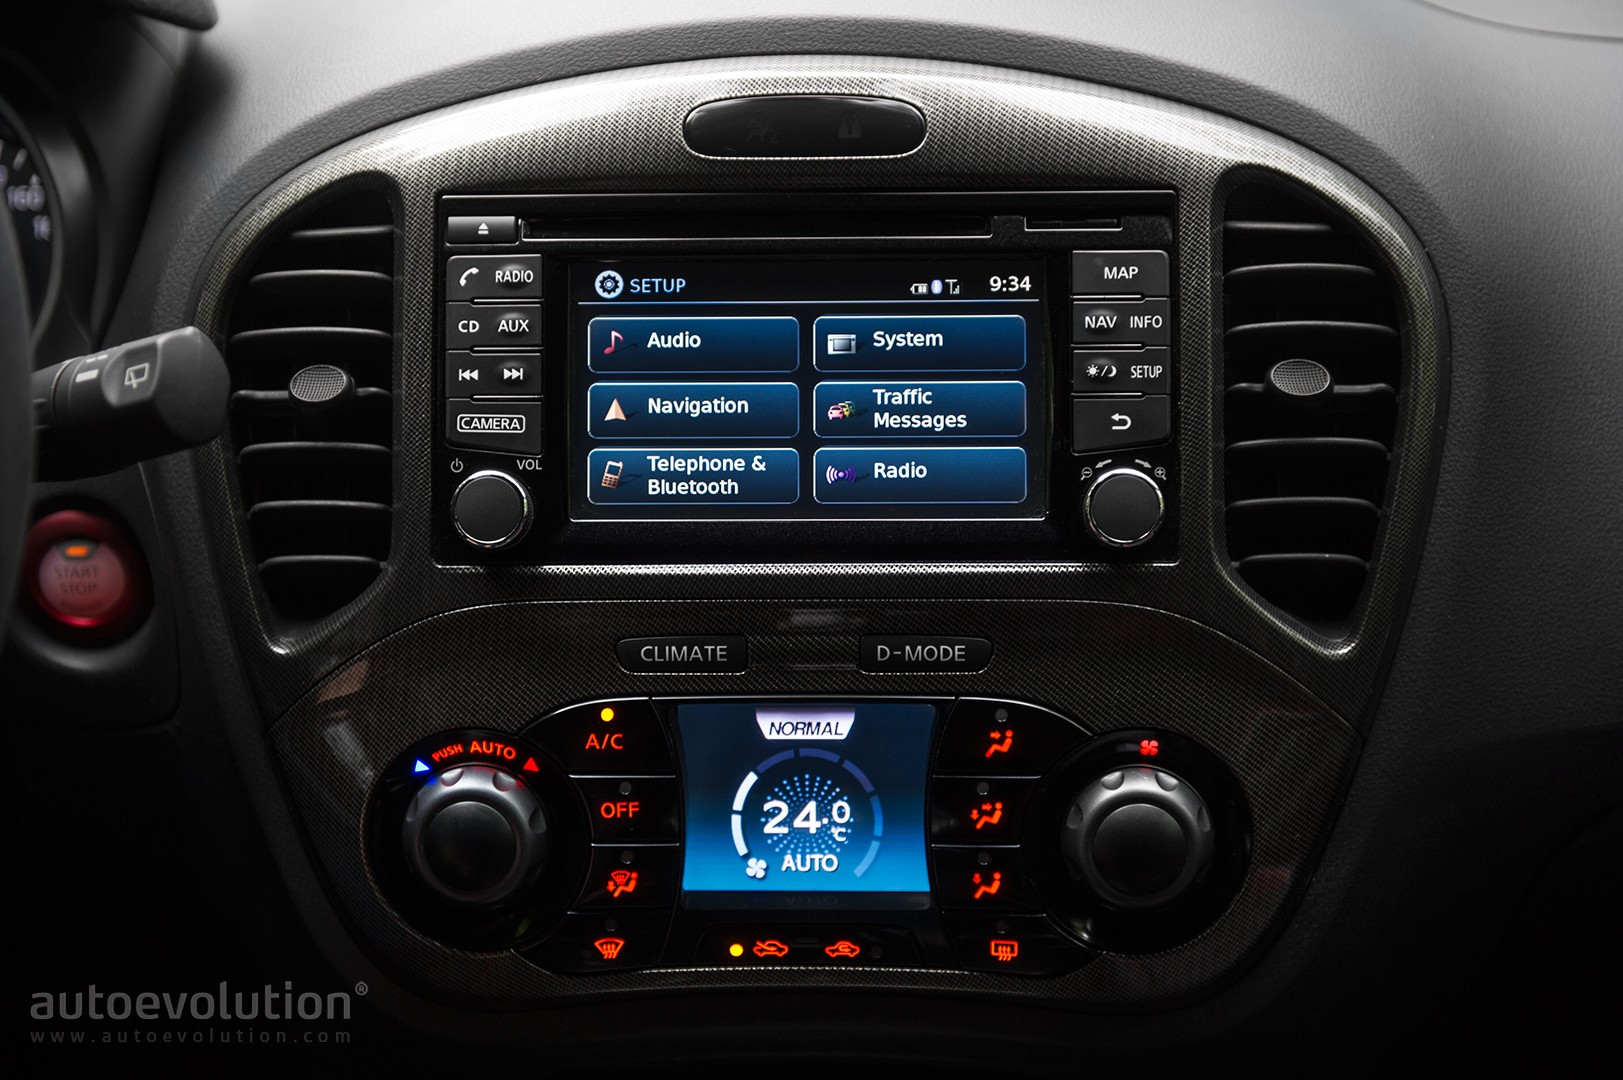 2016 Nissan Juke Nismo RS Review - autoevolution